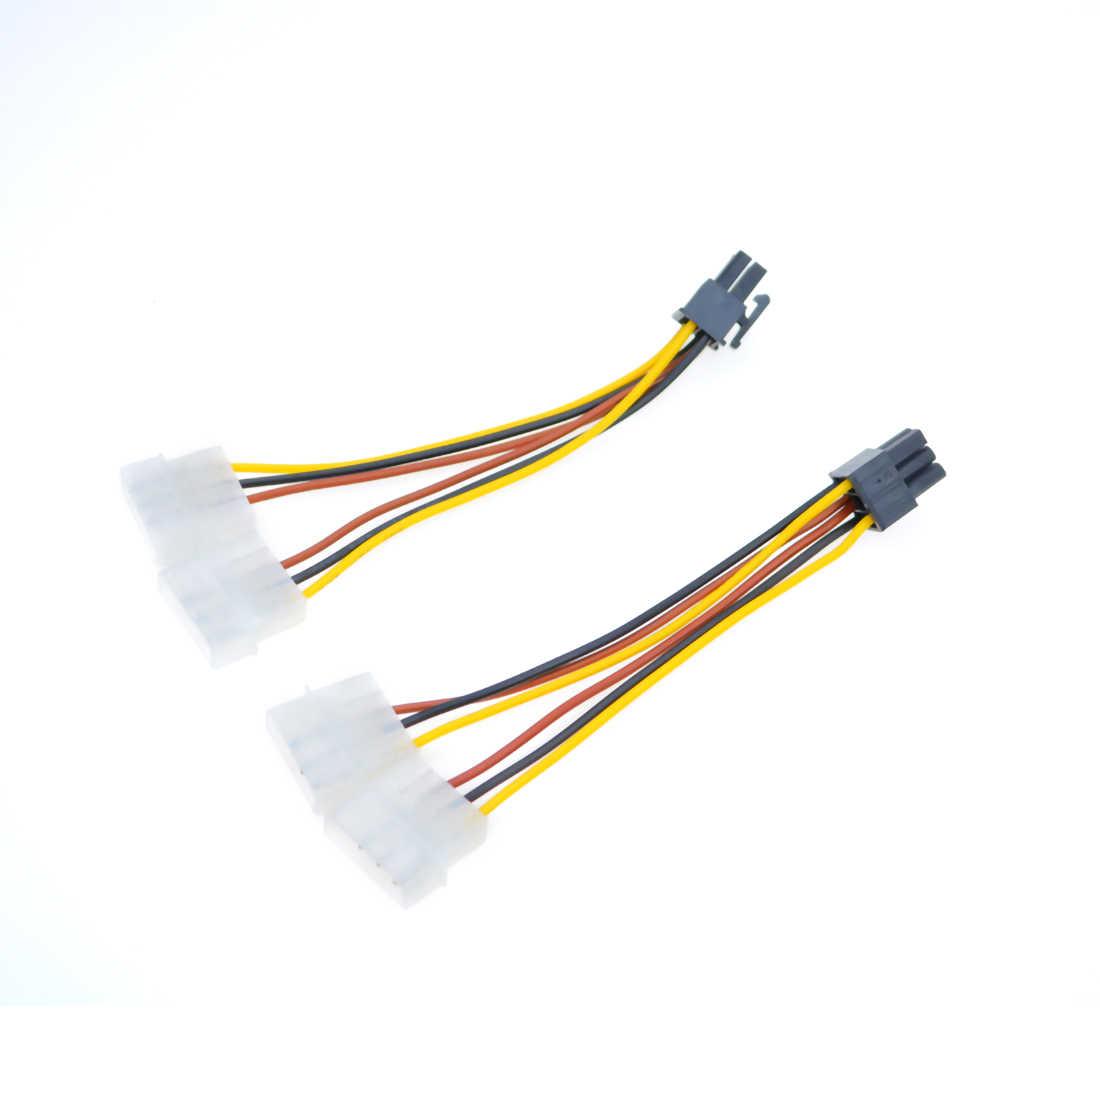 18cm ATX IDE הכפול 4 פינים 4 P כדי 6 פינים PCI-Express PCIE 6 P גרפי כרטיס כוח ממיר מתאם כבל Y ספליטר כבל